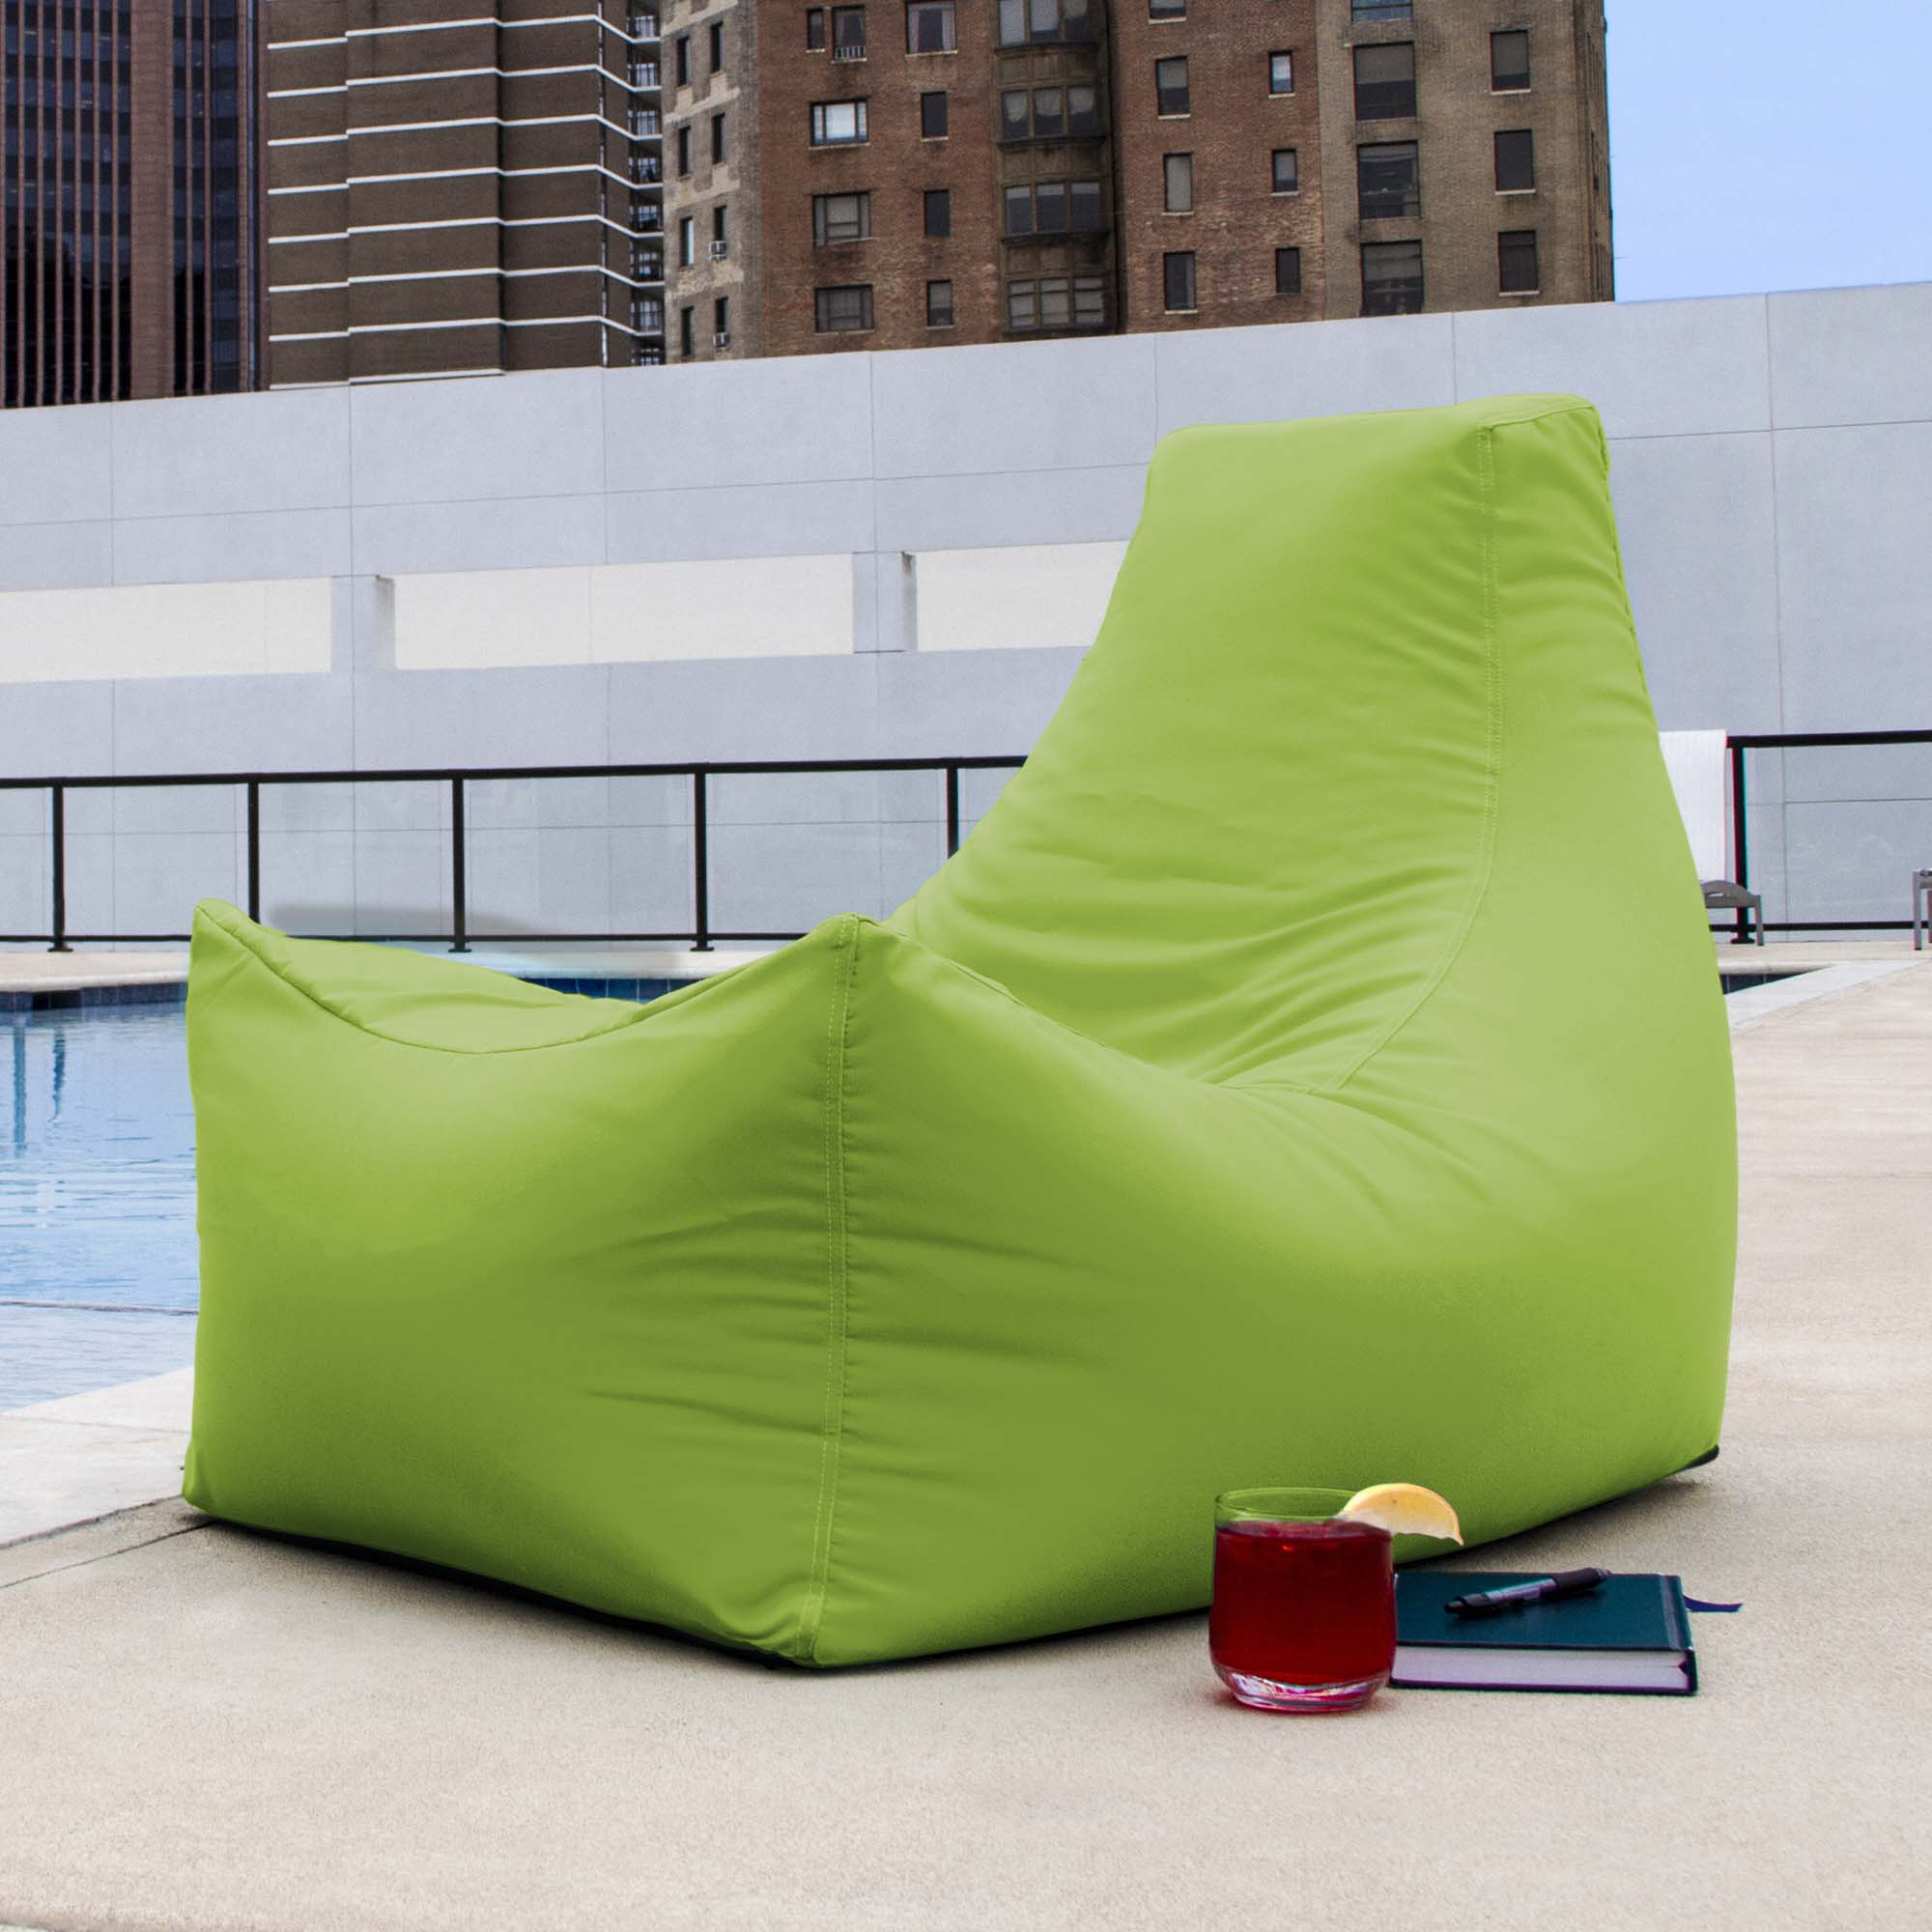 Excellent Jaxx Juniper Outdoor Bean Bag Lounge Chair Lime Cjindustries Chair Design For Home Cjindustriesco